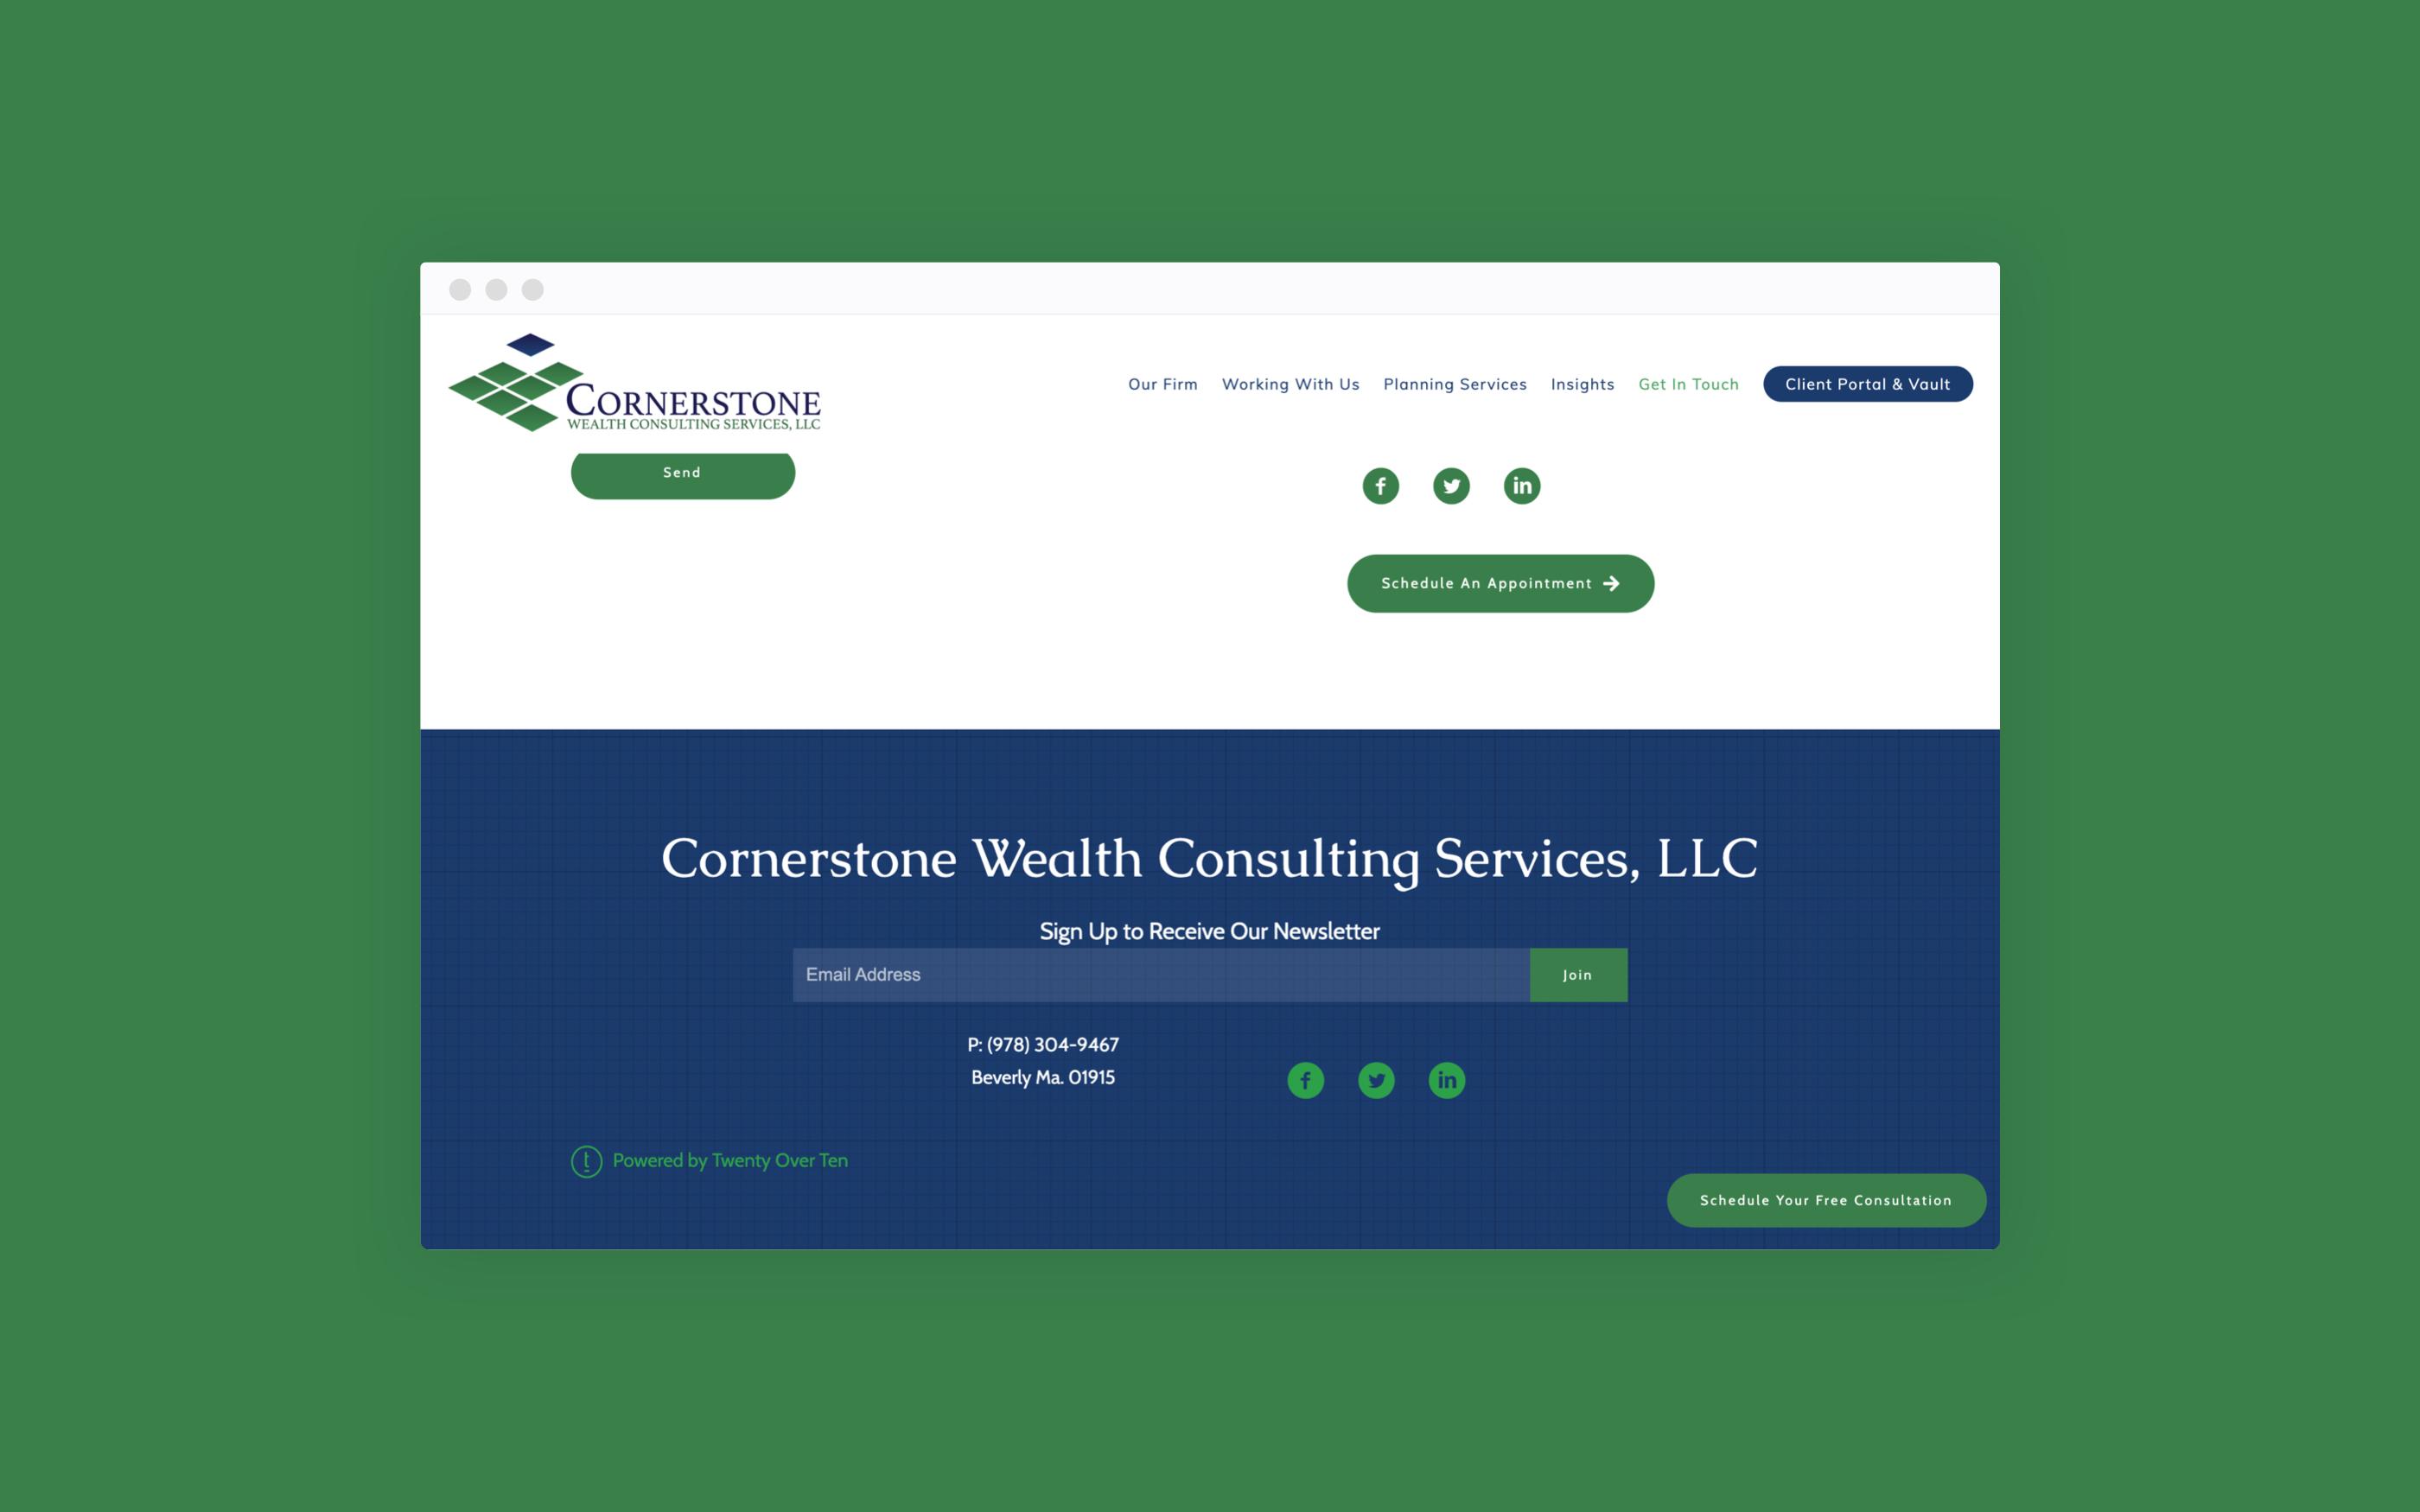 Cornerstone Wealth Services social media